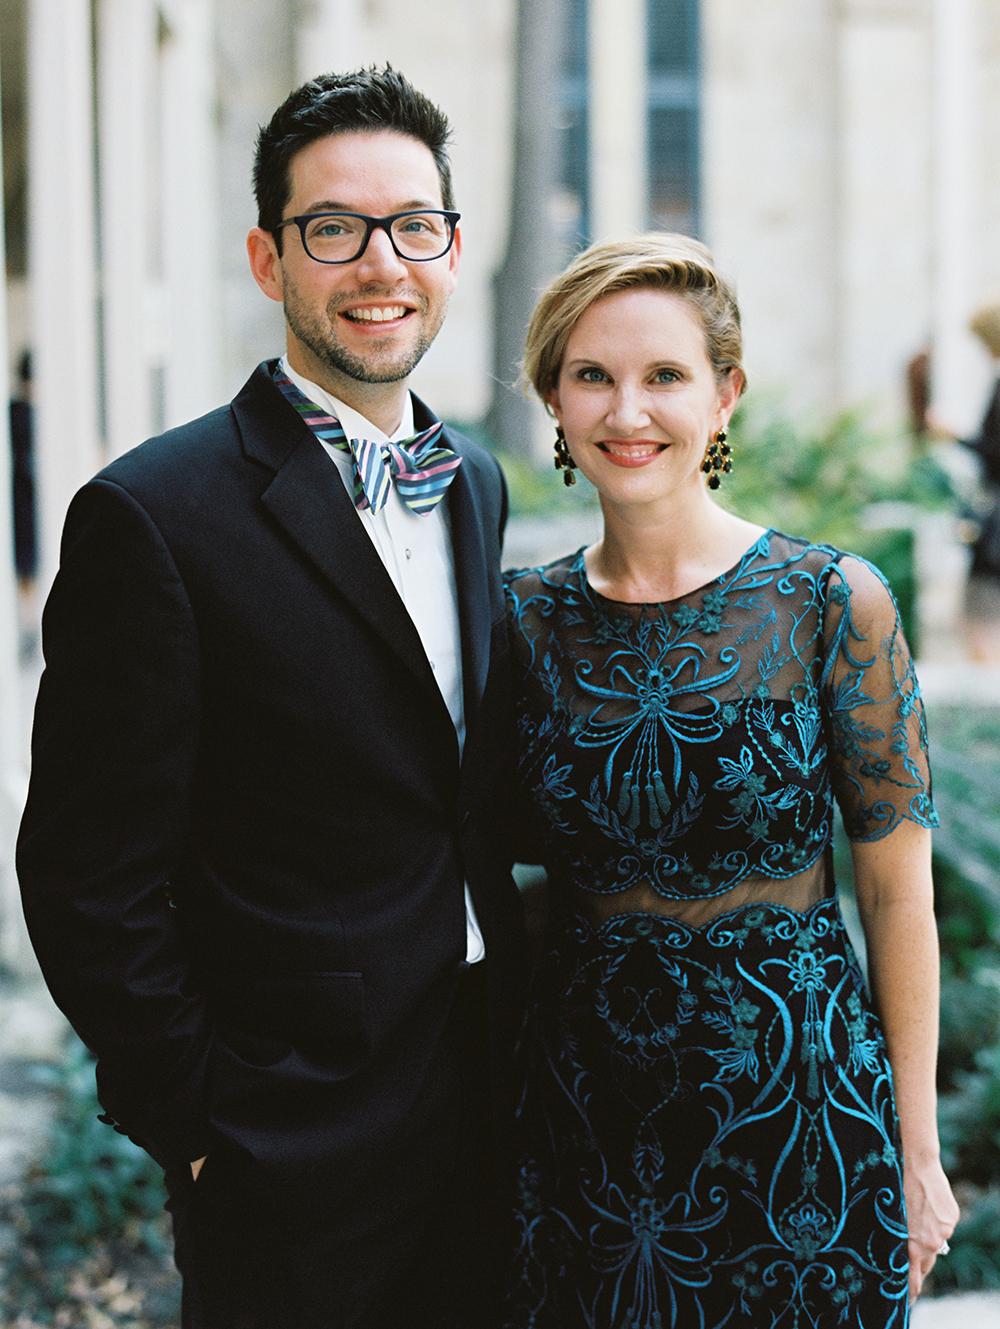 fall wedding guests attire dark vibrant colors